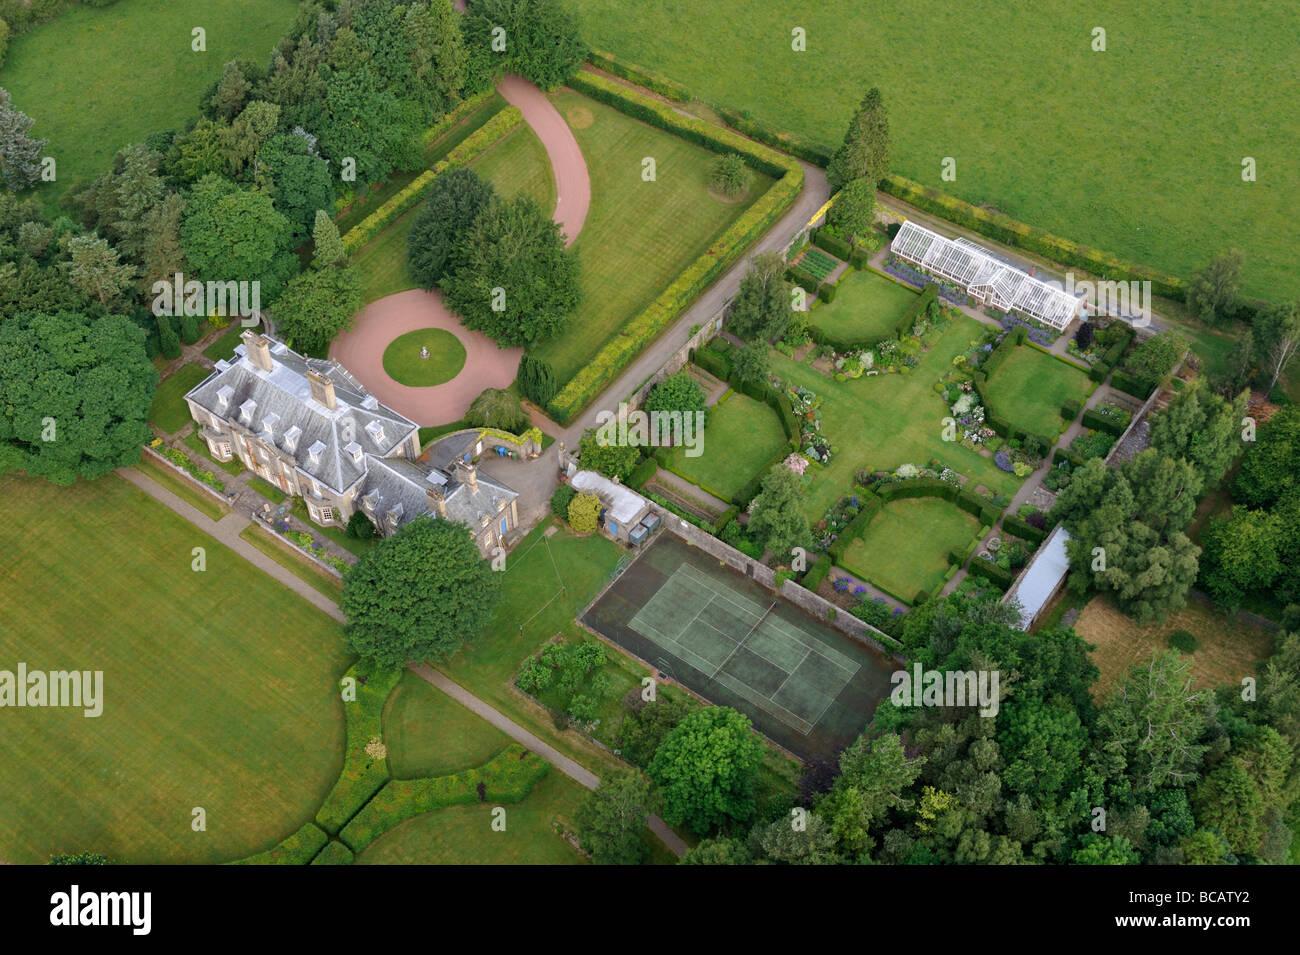 Aerial view of Symington House. South Lanarkshire, Scotland, United Kingdom, Europe. - Stock Image